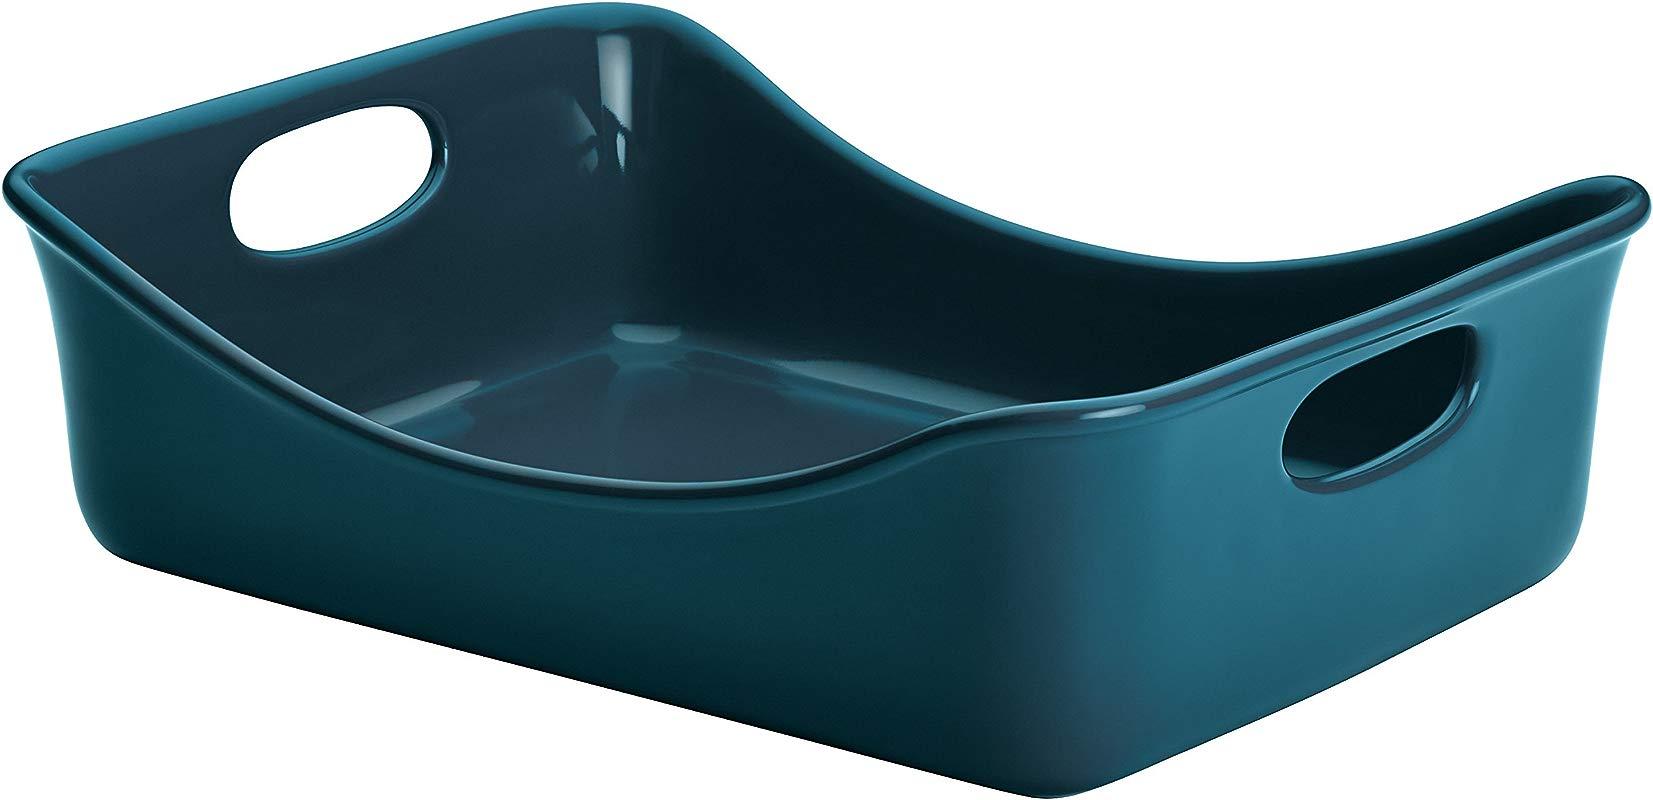 Rachael Ray Stoneware Baker 9 X 12 Marine Blue